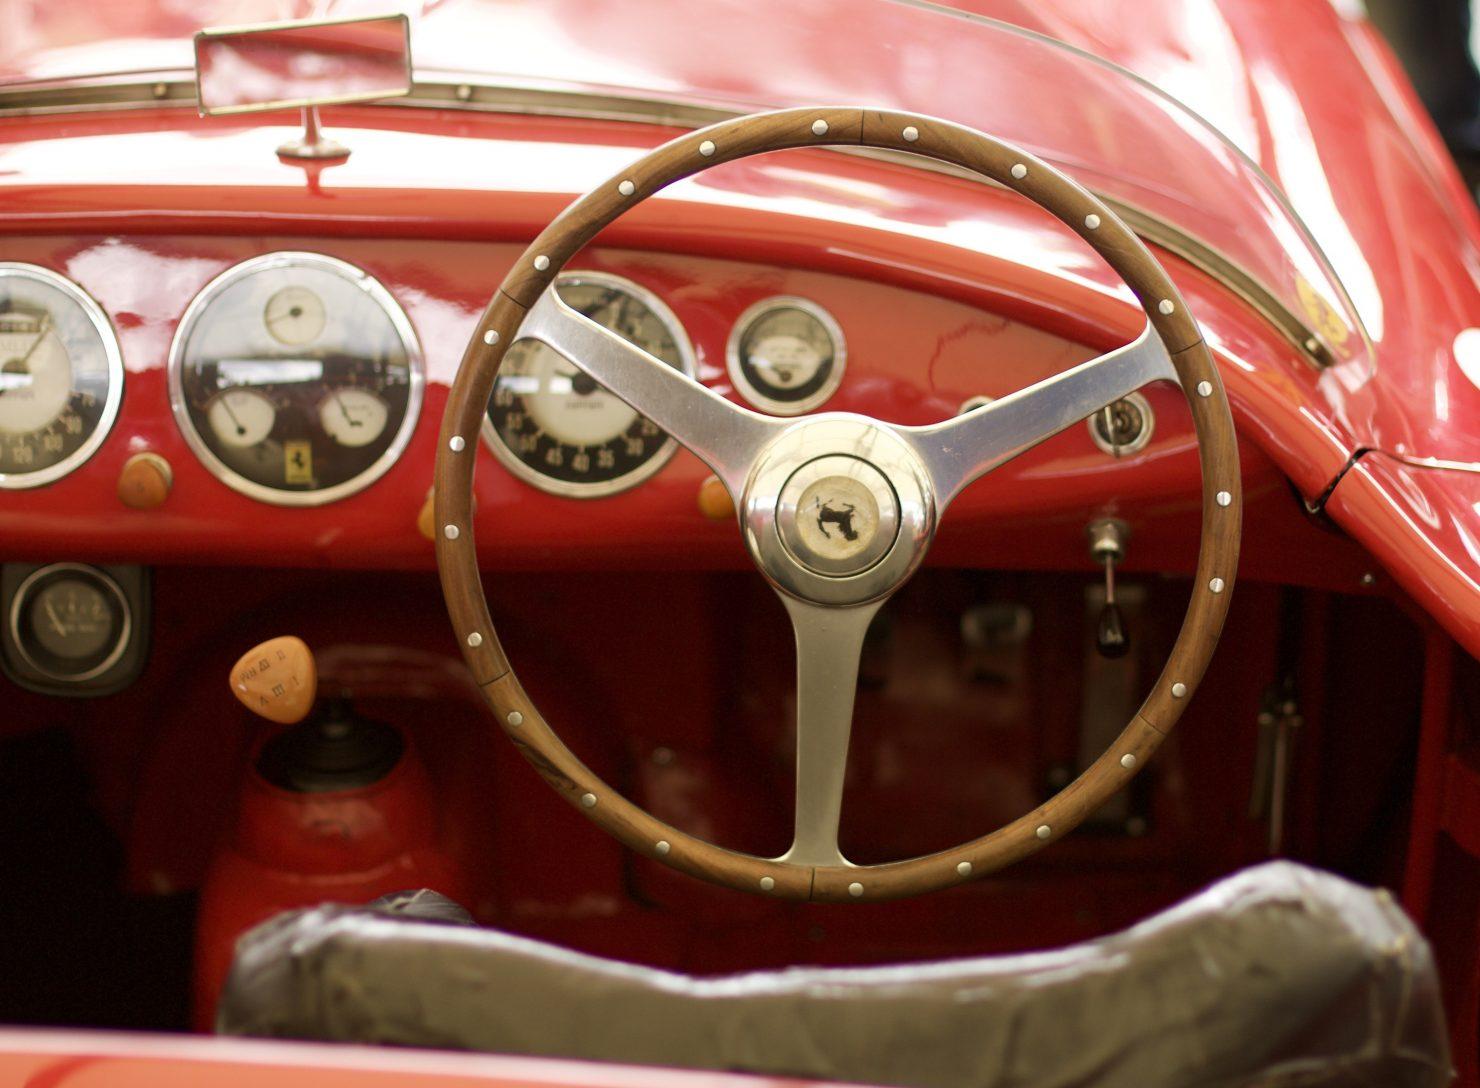 1950 Ferrari 166 MM Barchetta 1480x1088 - Cockpits of Goodwood